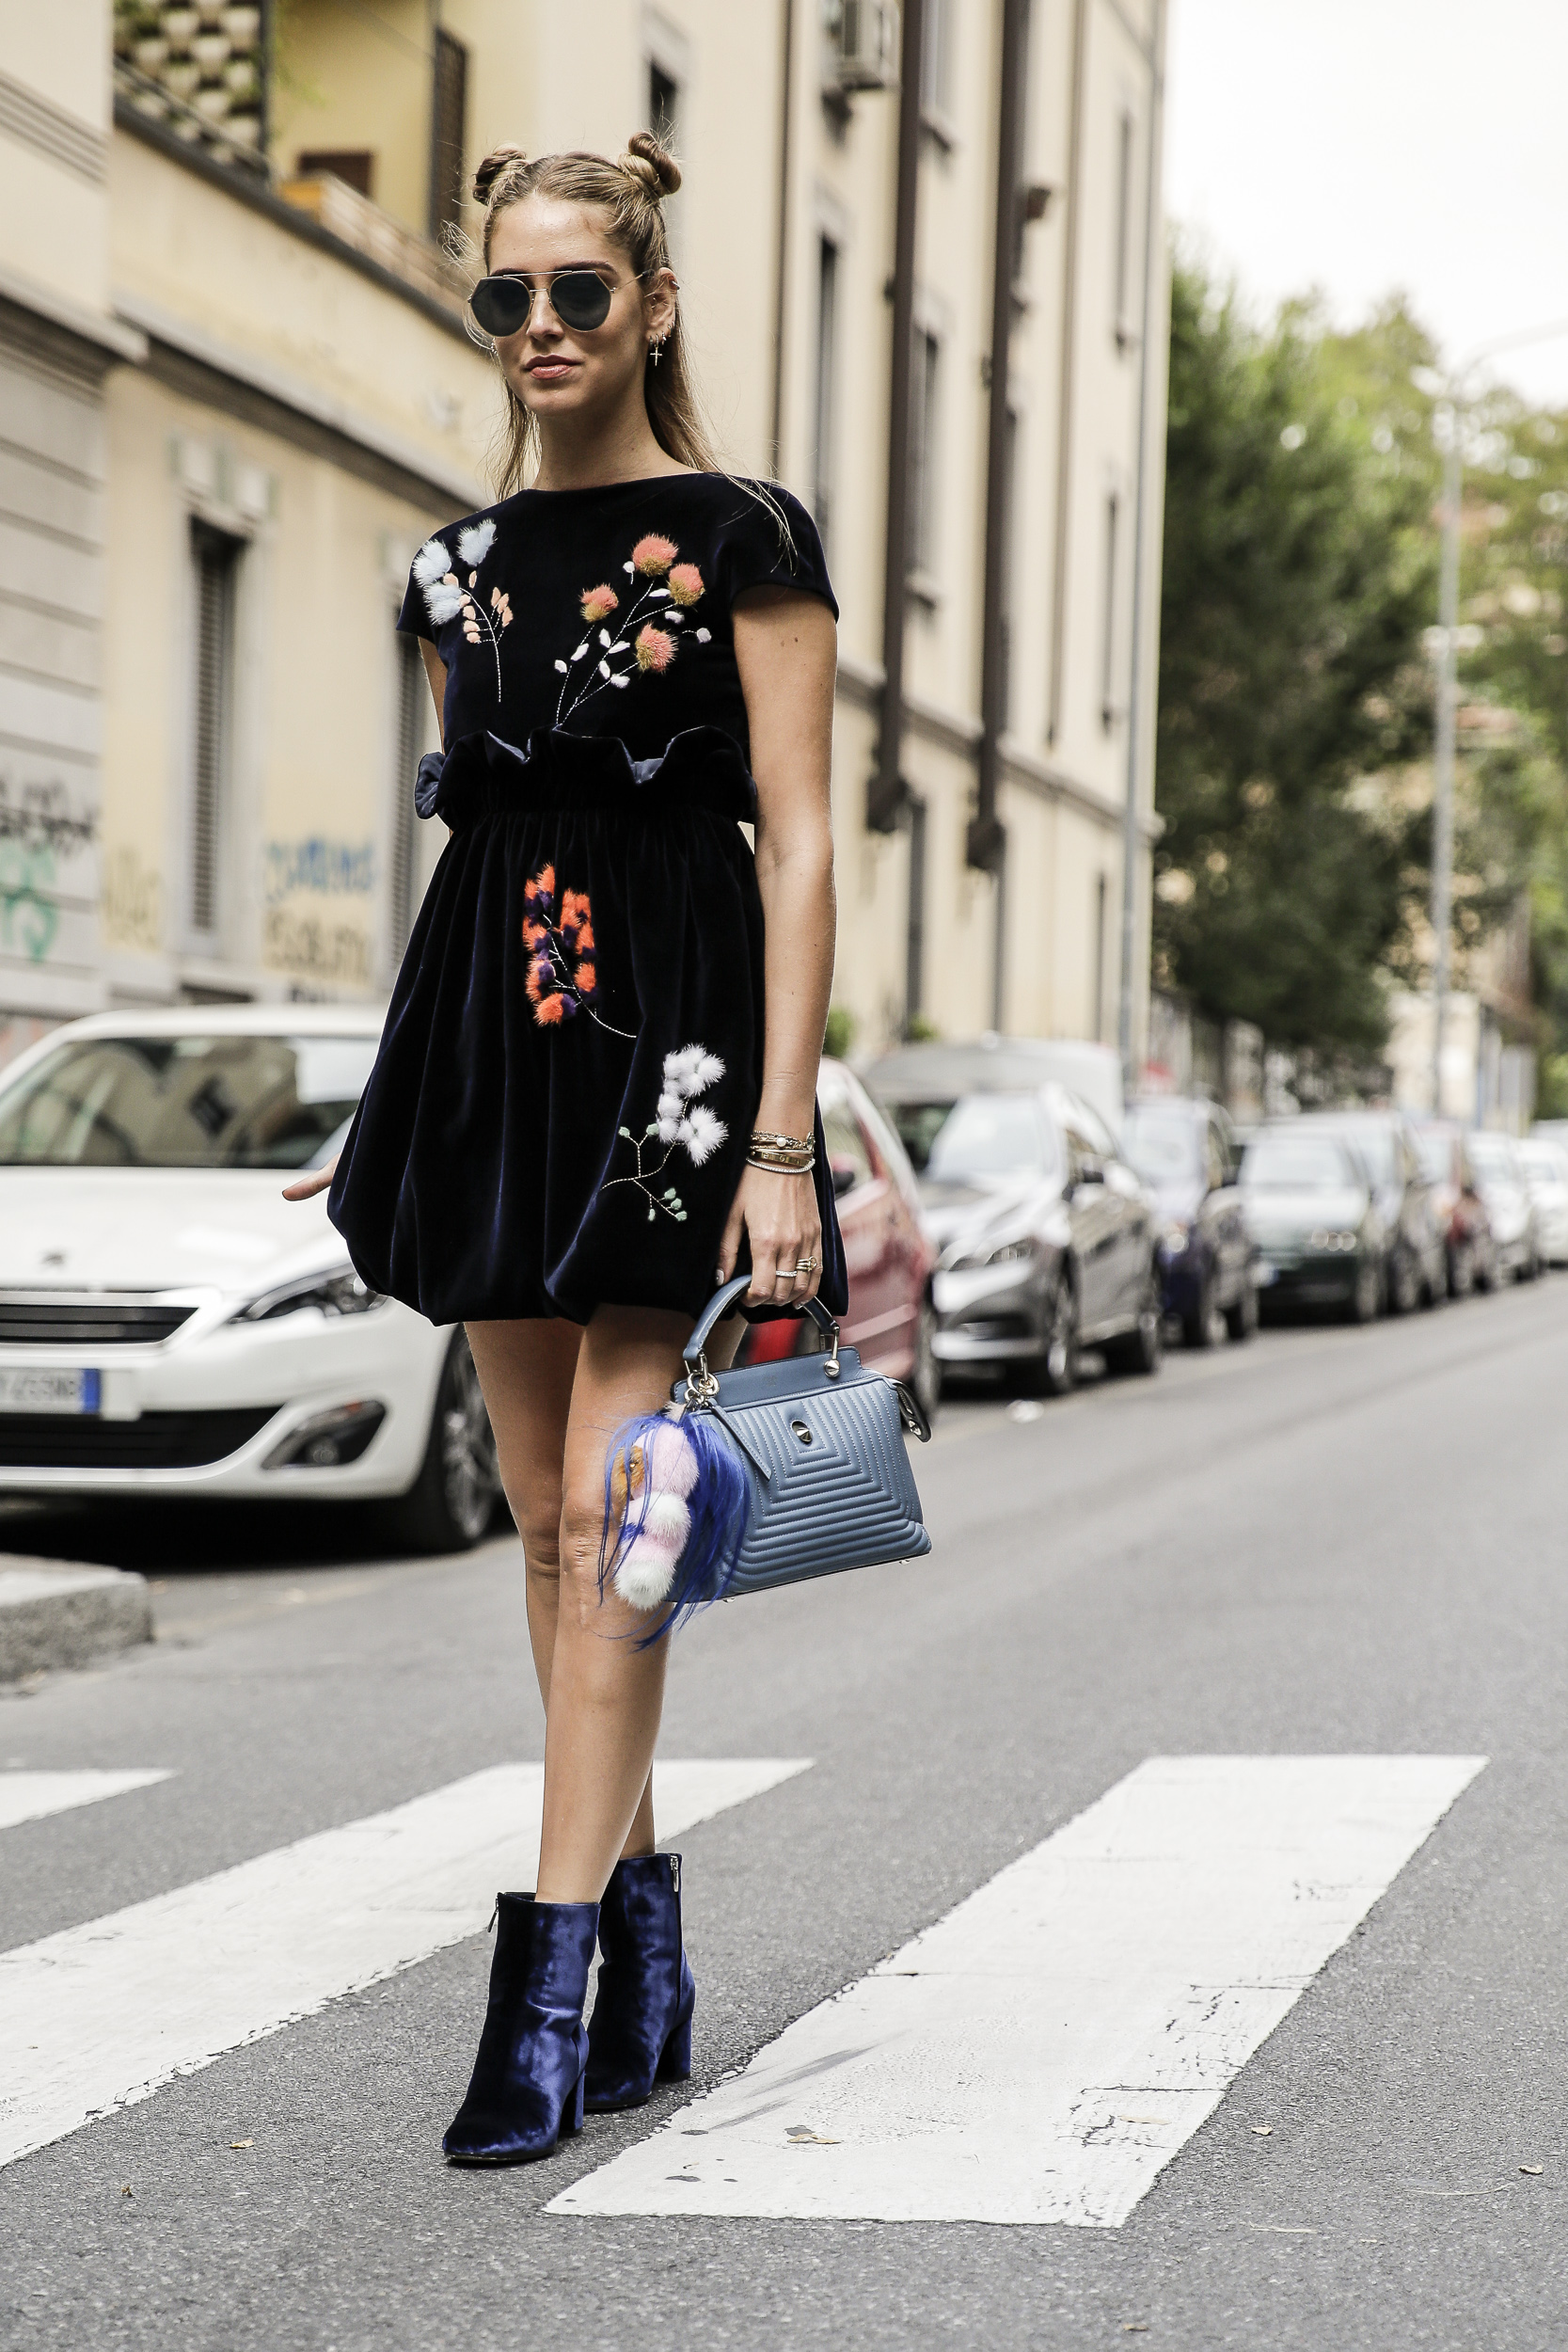 Chiara Ferragni at the Fendi SS17 Show during Milan Fashion Week